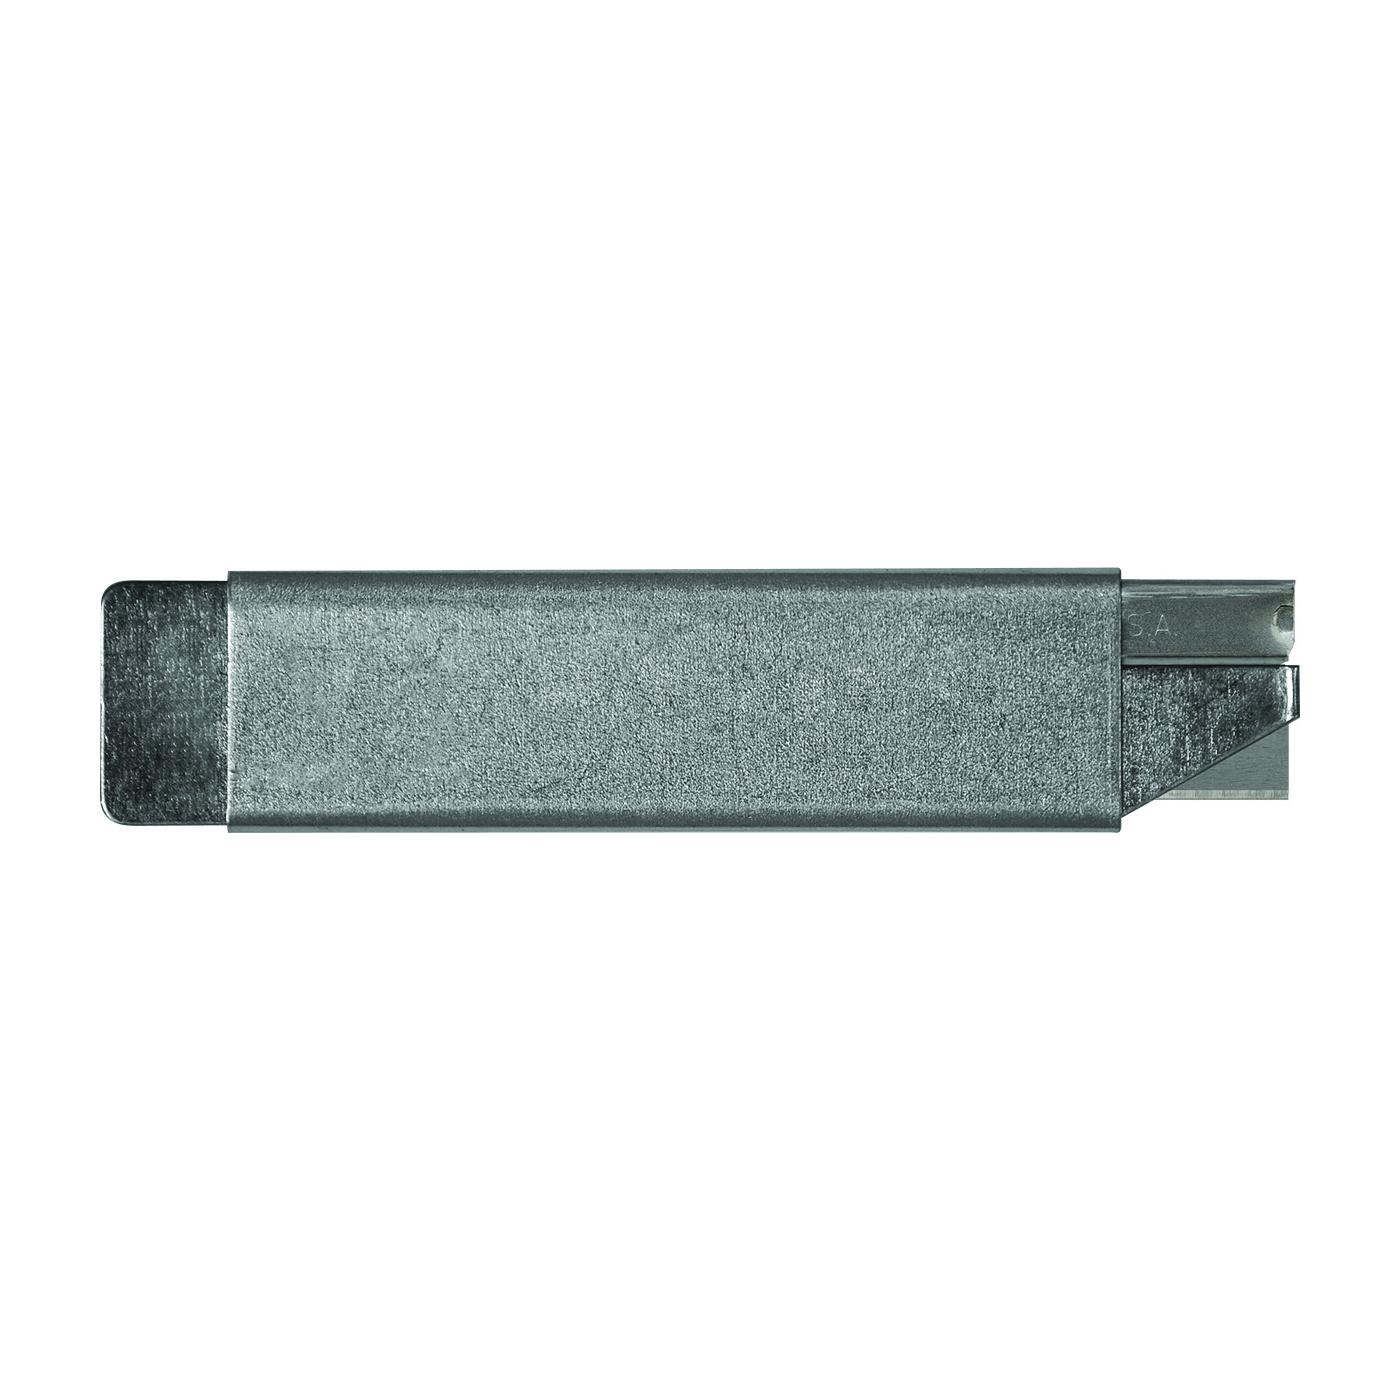 Techni Edge TE05-301